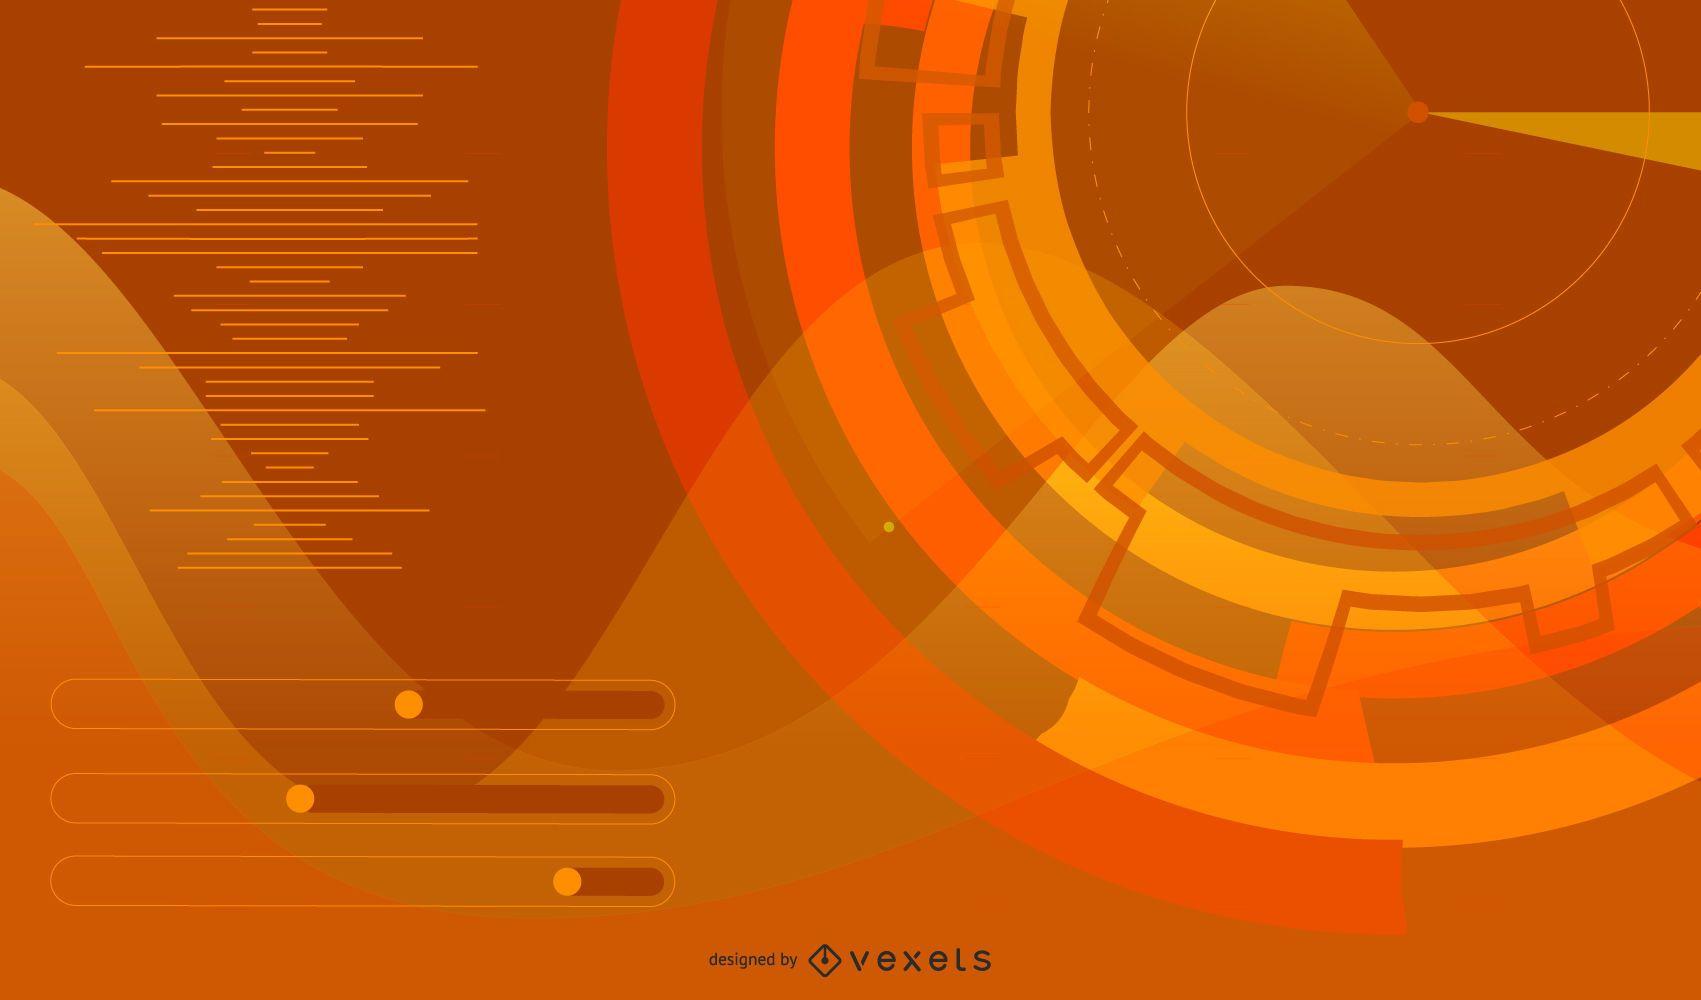 Futuristic background in orange